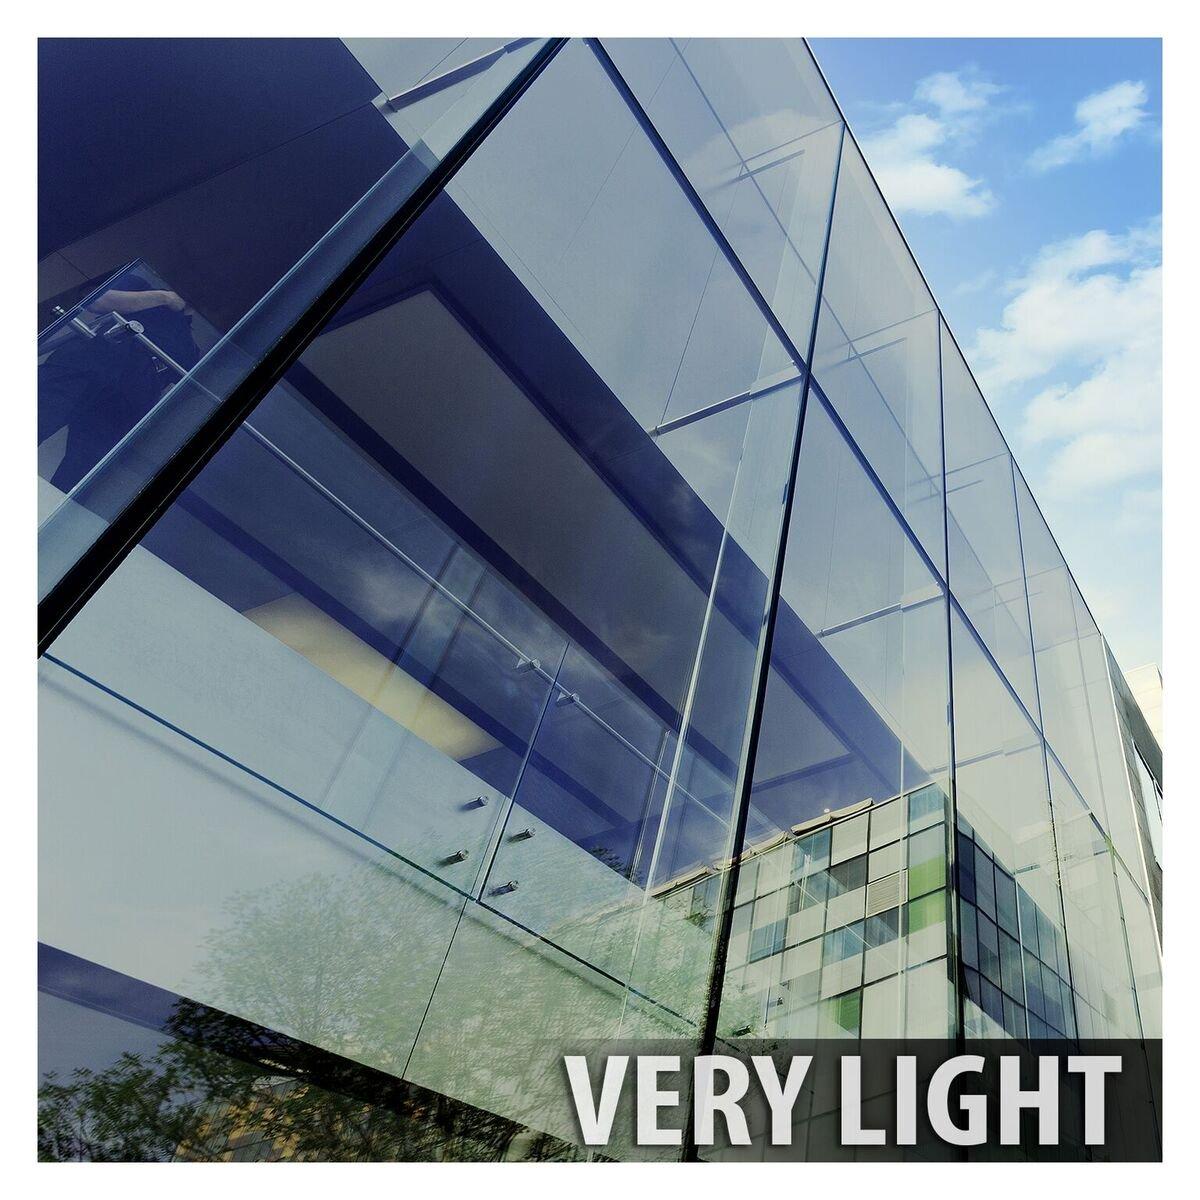 BDF NSN70 Window Film Transparent Ultra High Heat Rejection & UV Cut NSN 70 (Very Light) - 36in X 14ft